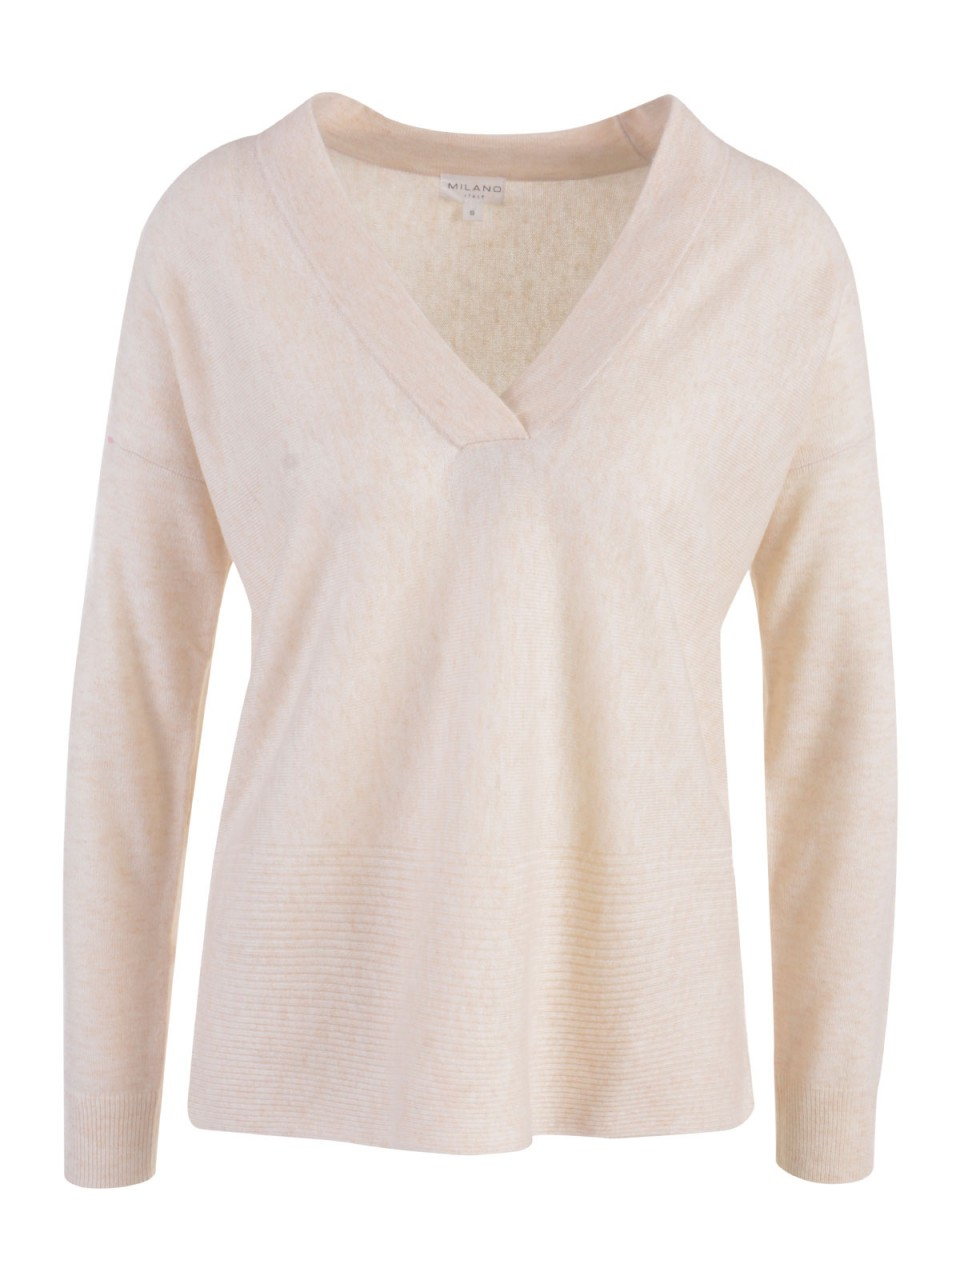 milano-italy-damen-pullover-sand